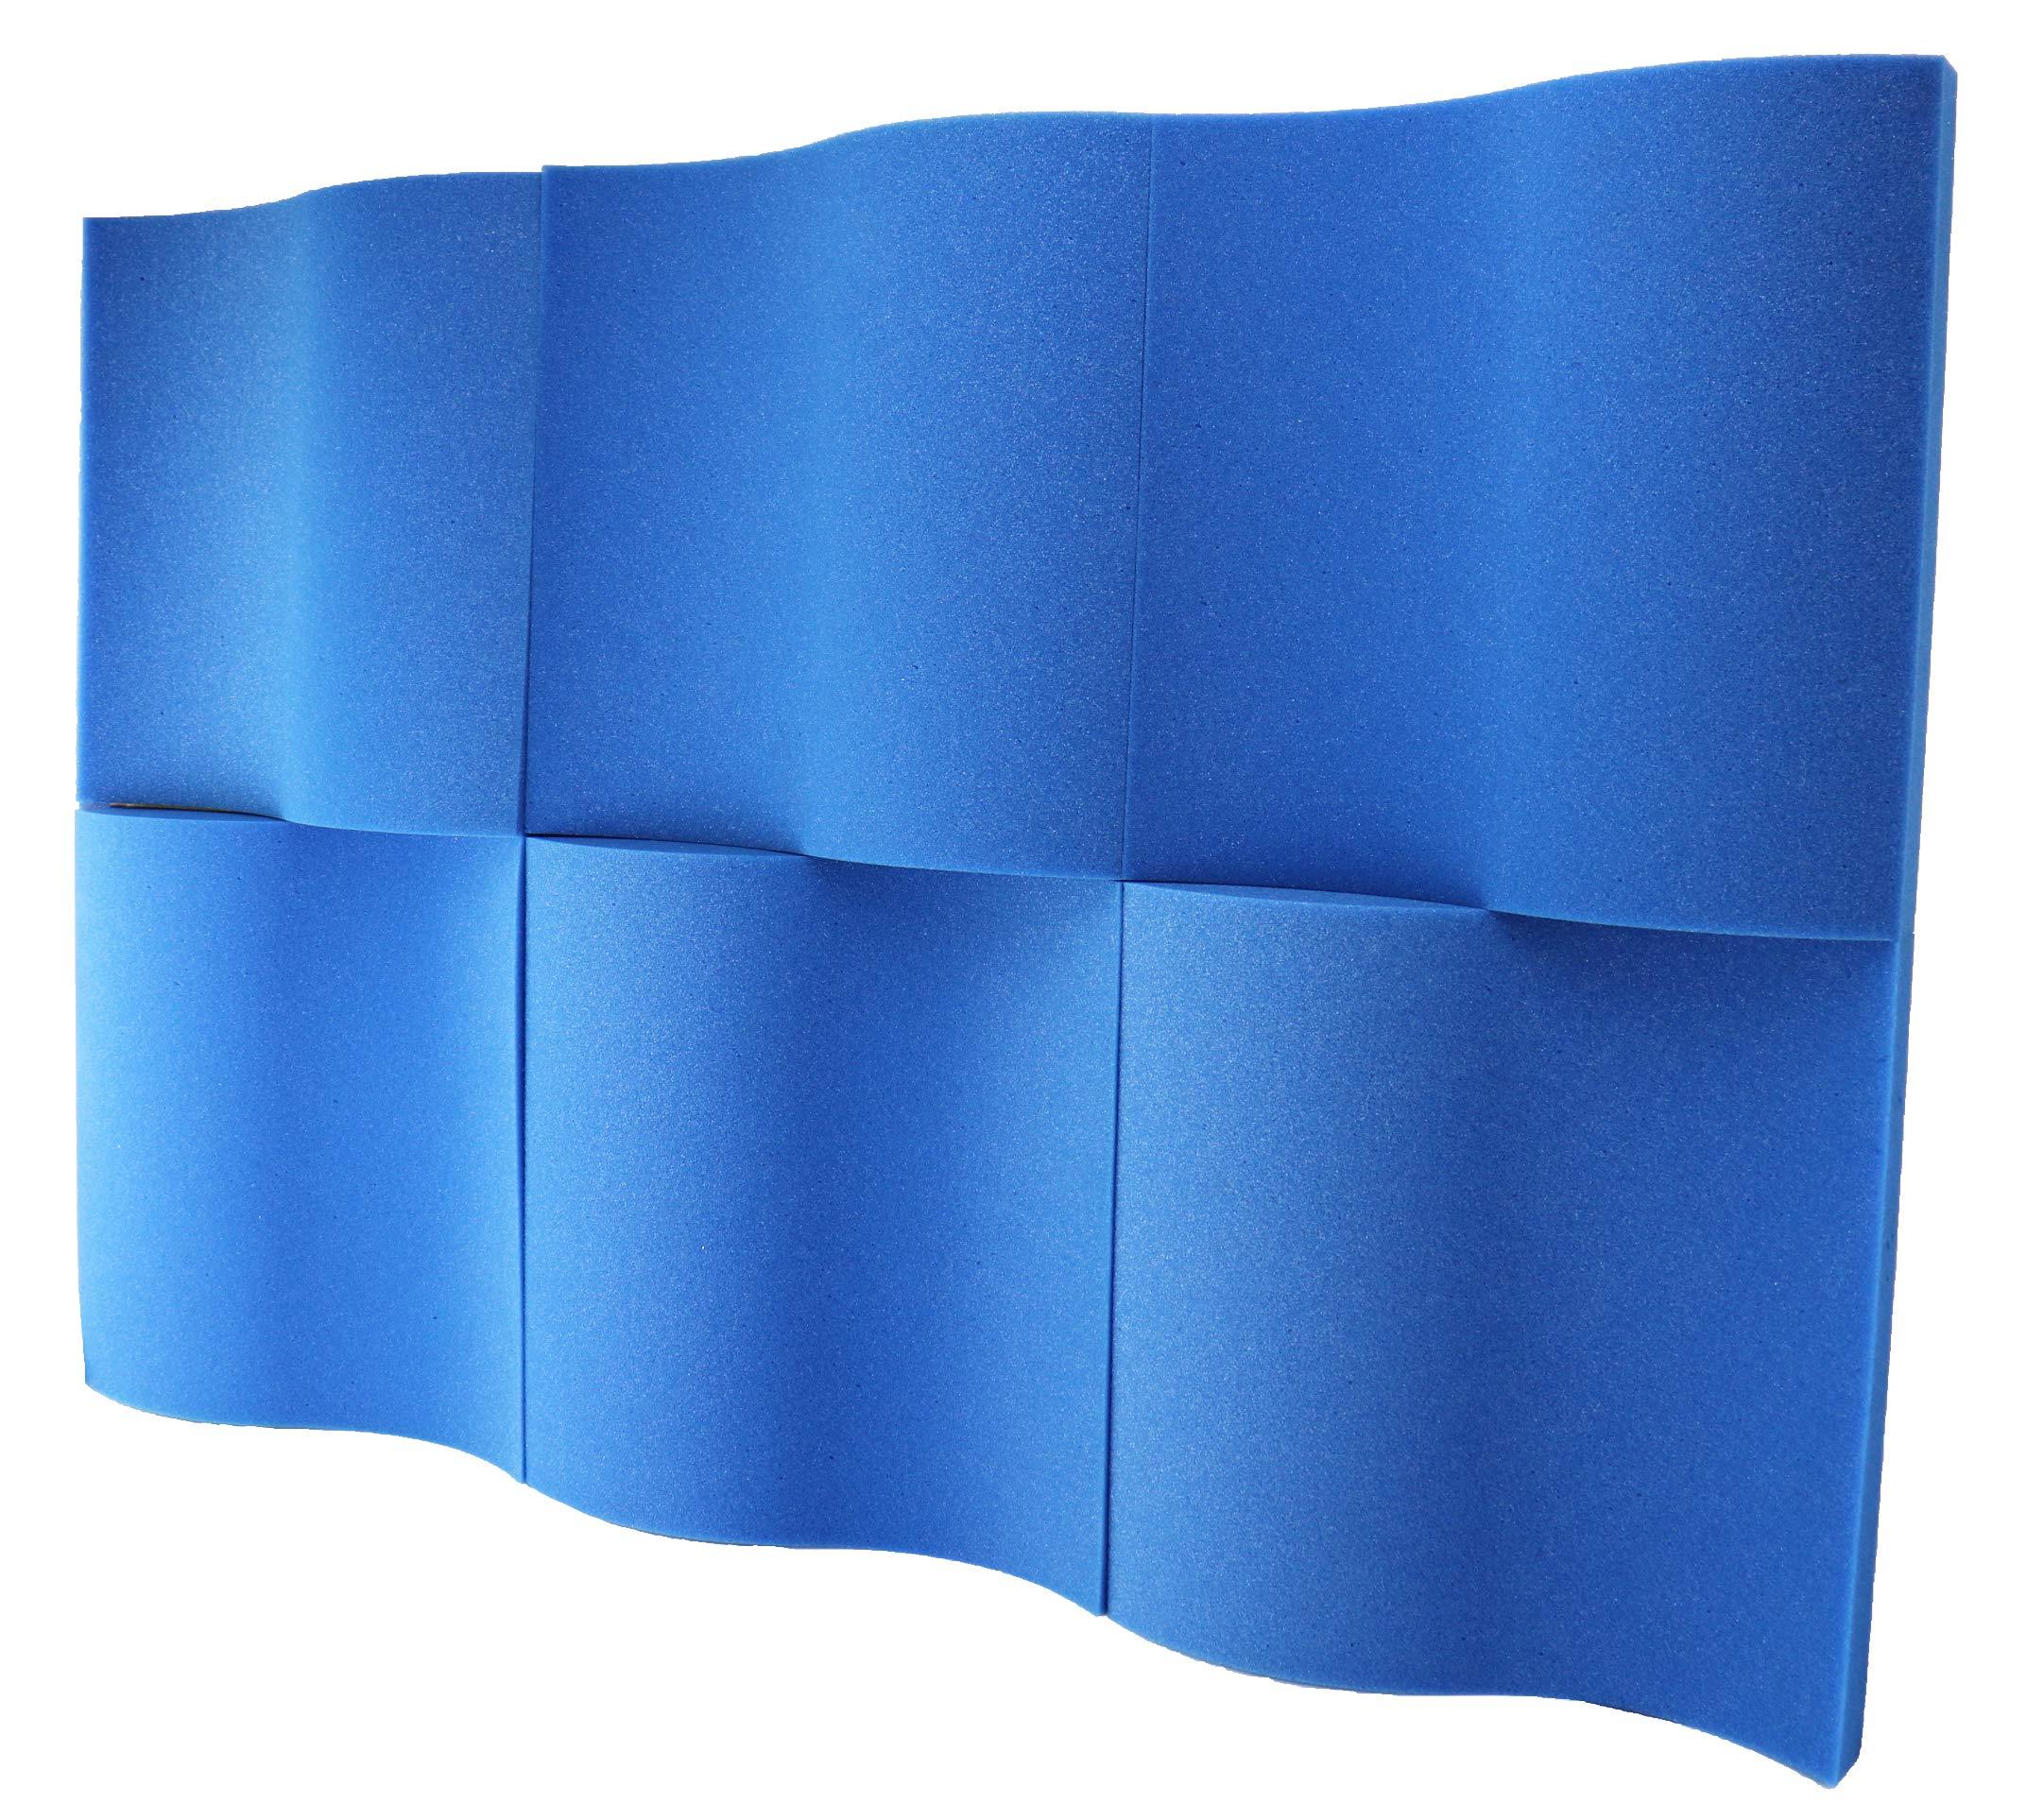 Foamily 6 Pack - Blue Decorative Acoustic Panels Studio Foam Waves 2'' X 12'' X 12''